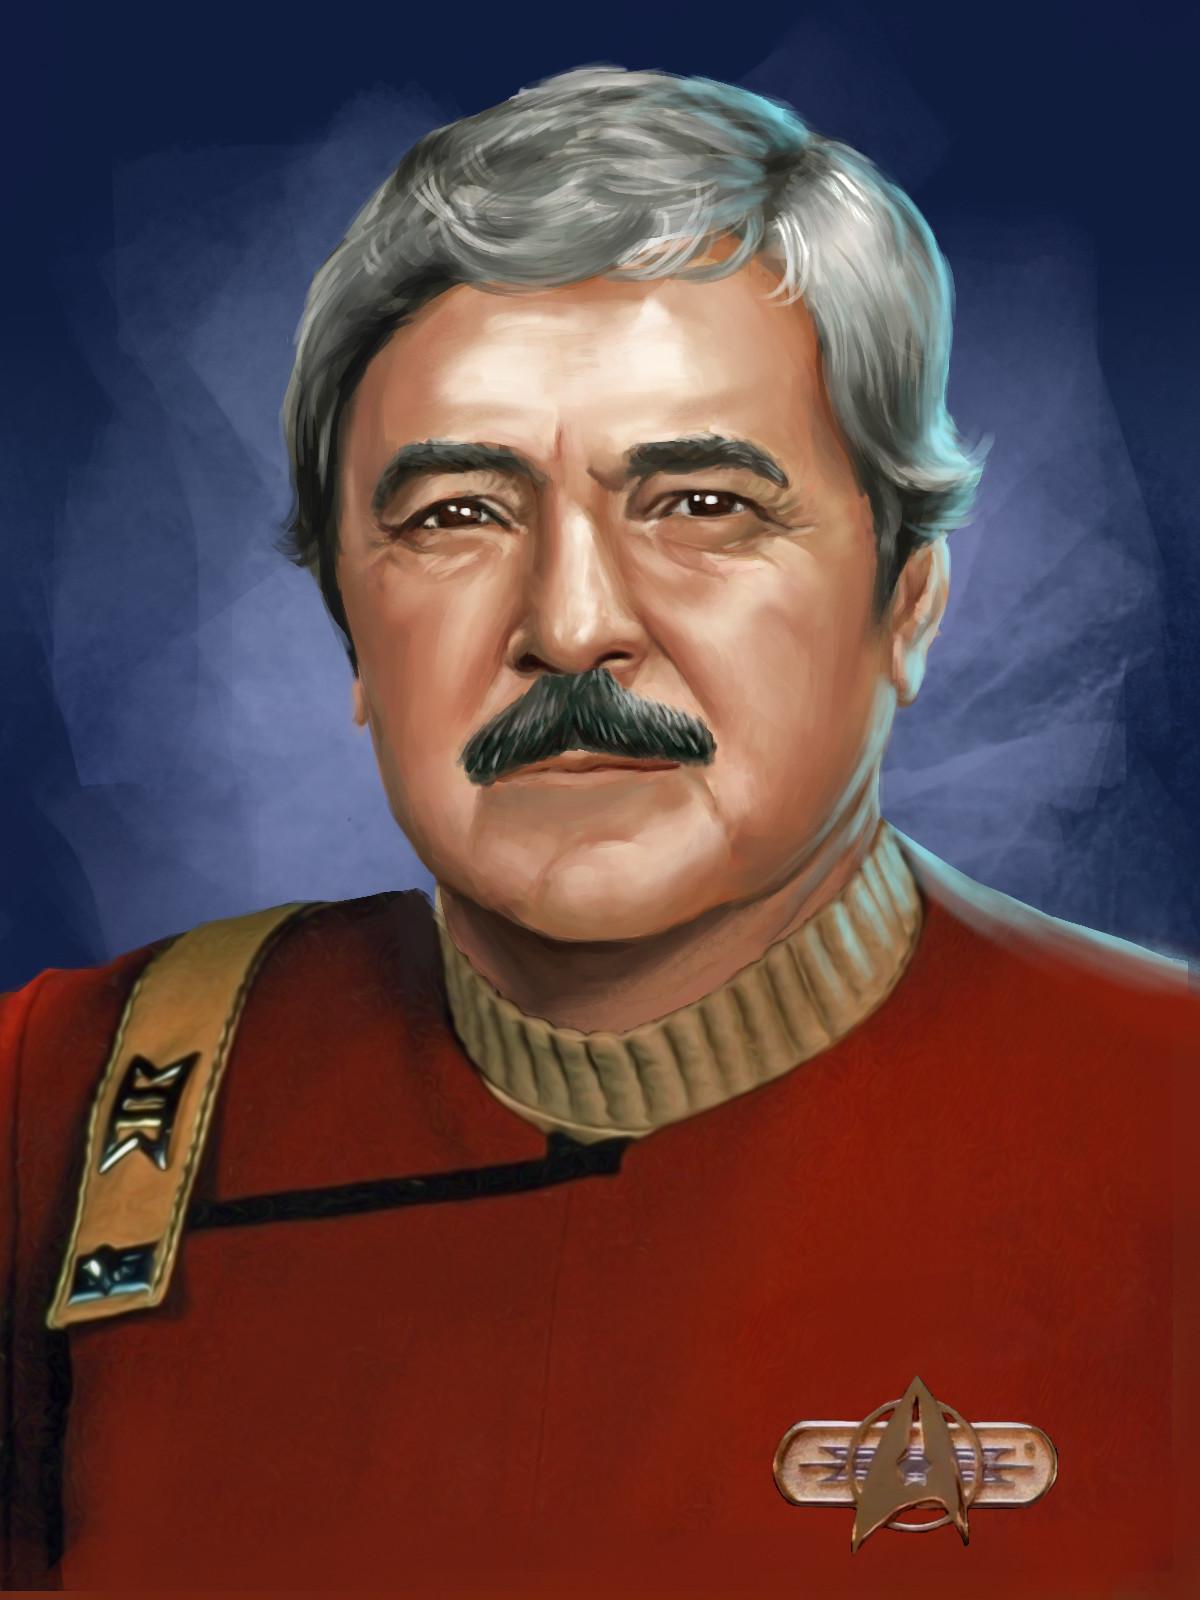 Star Trek Wrath of Gems Scotty Tier 3